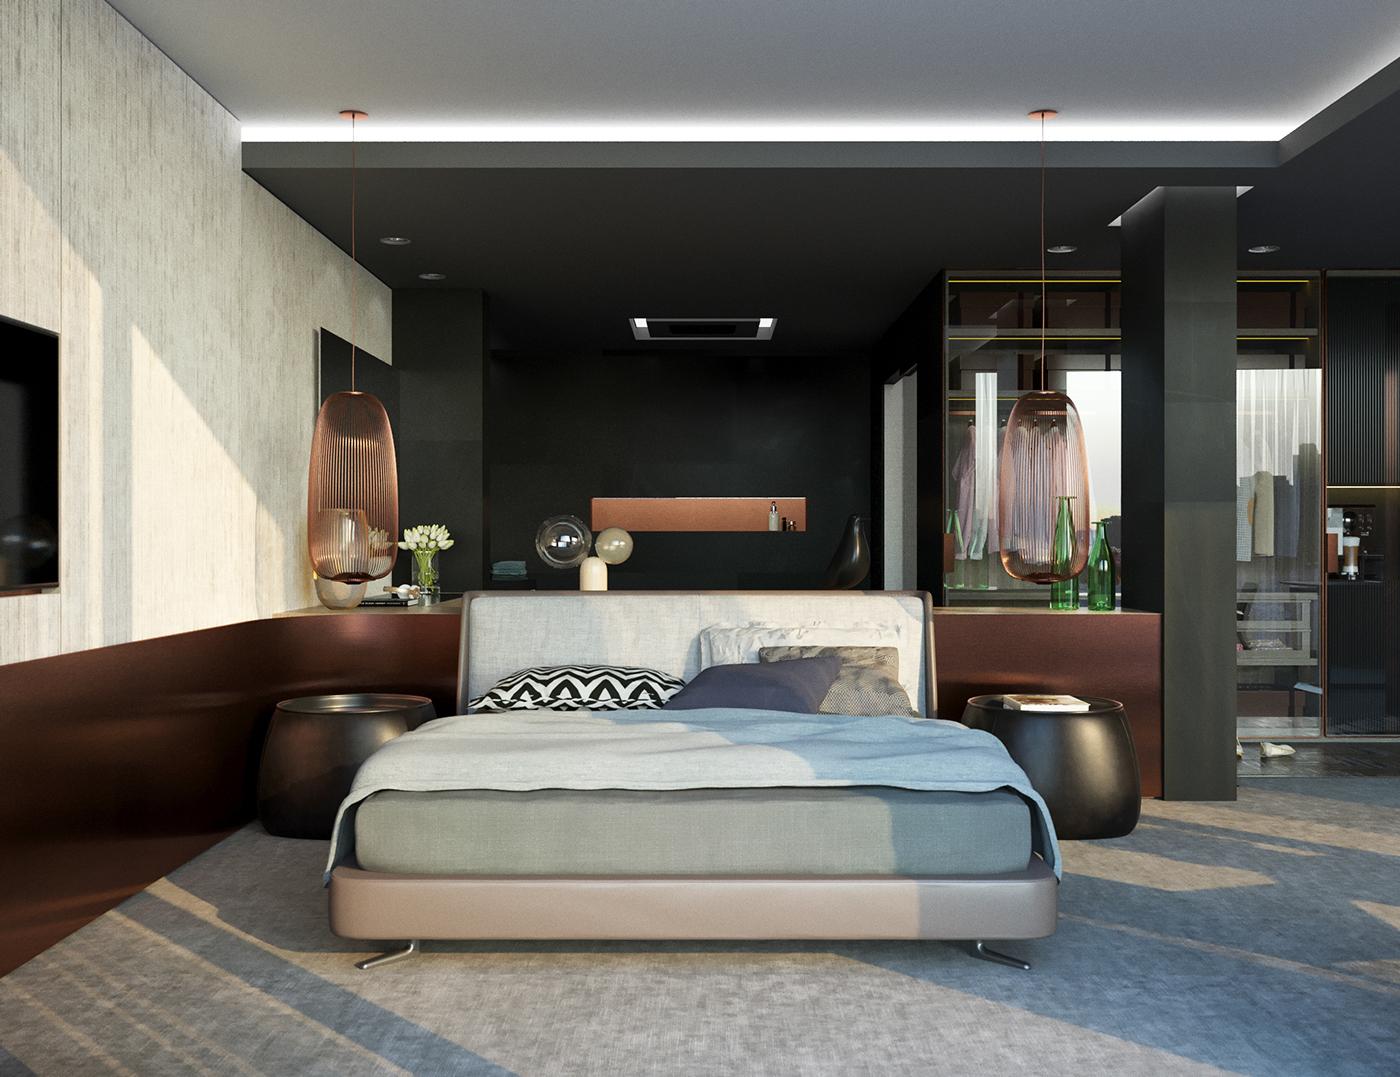 Project Design by Fatih Beserek and Kadir